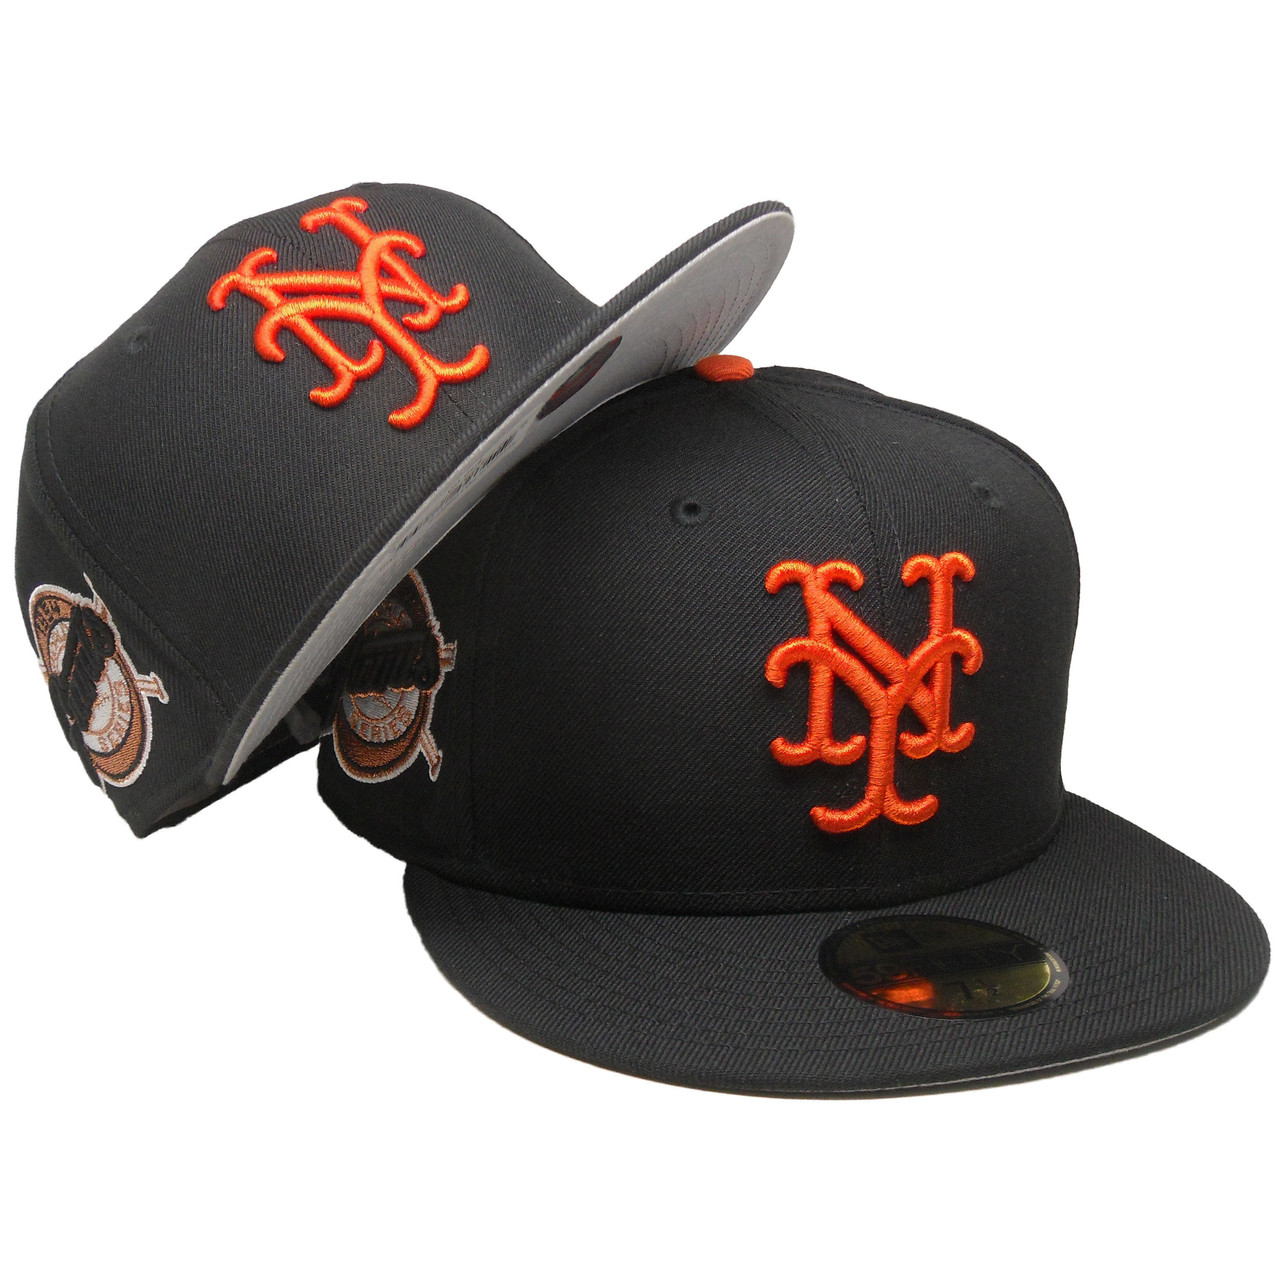 0ebd5e619398e0 New York Giants 54 WS New Era Custom 59Fifty Fitted - Black, Orange, Copper